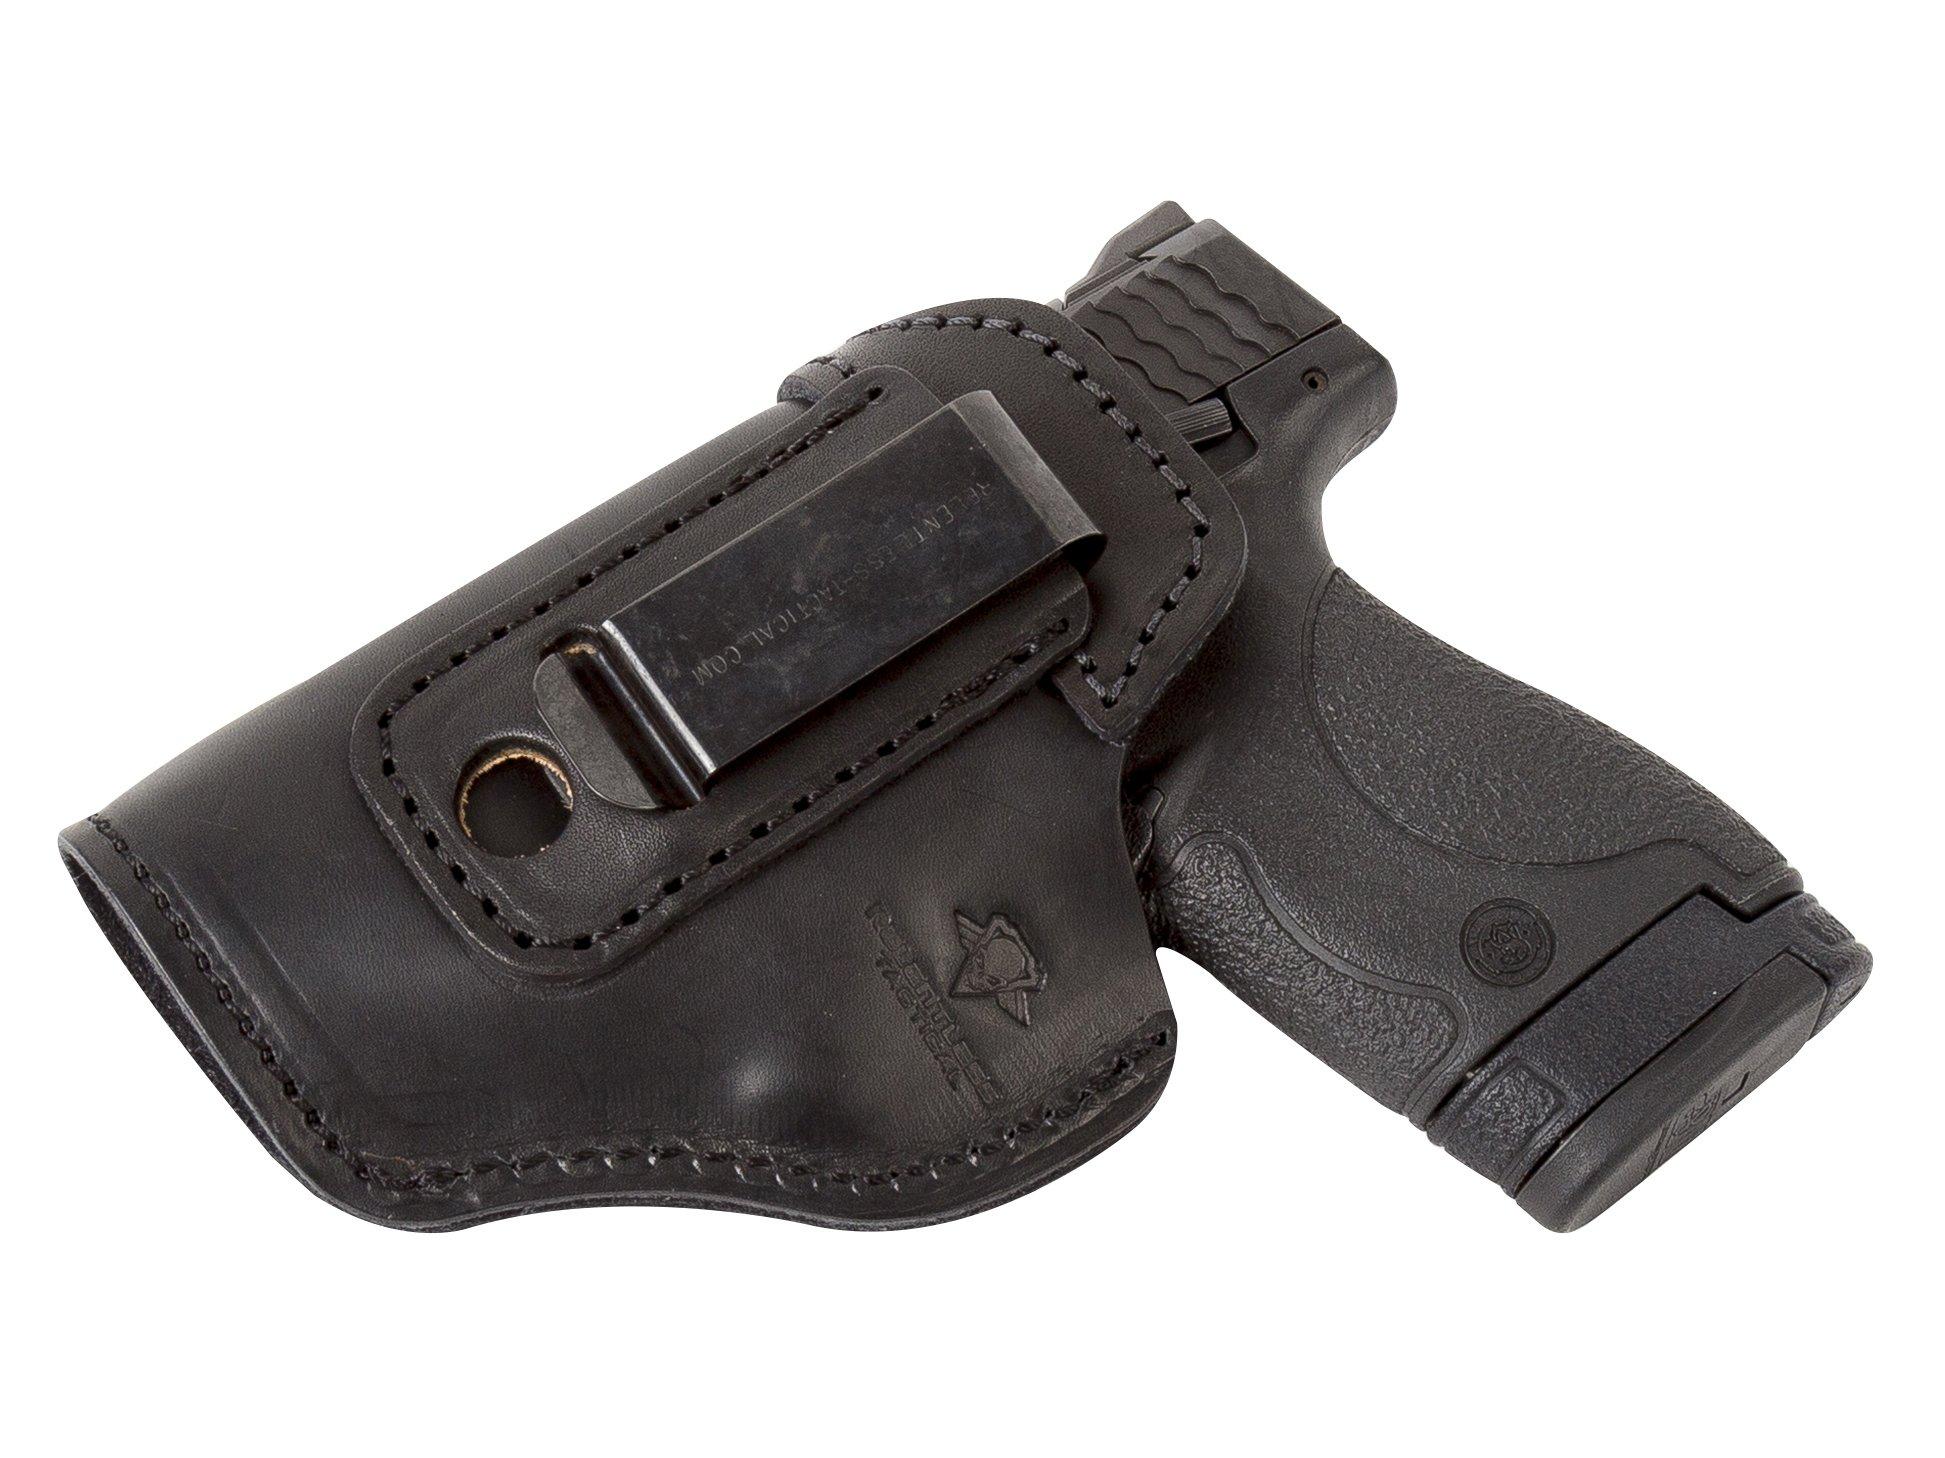 Defender Leather IWB Holster